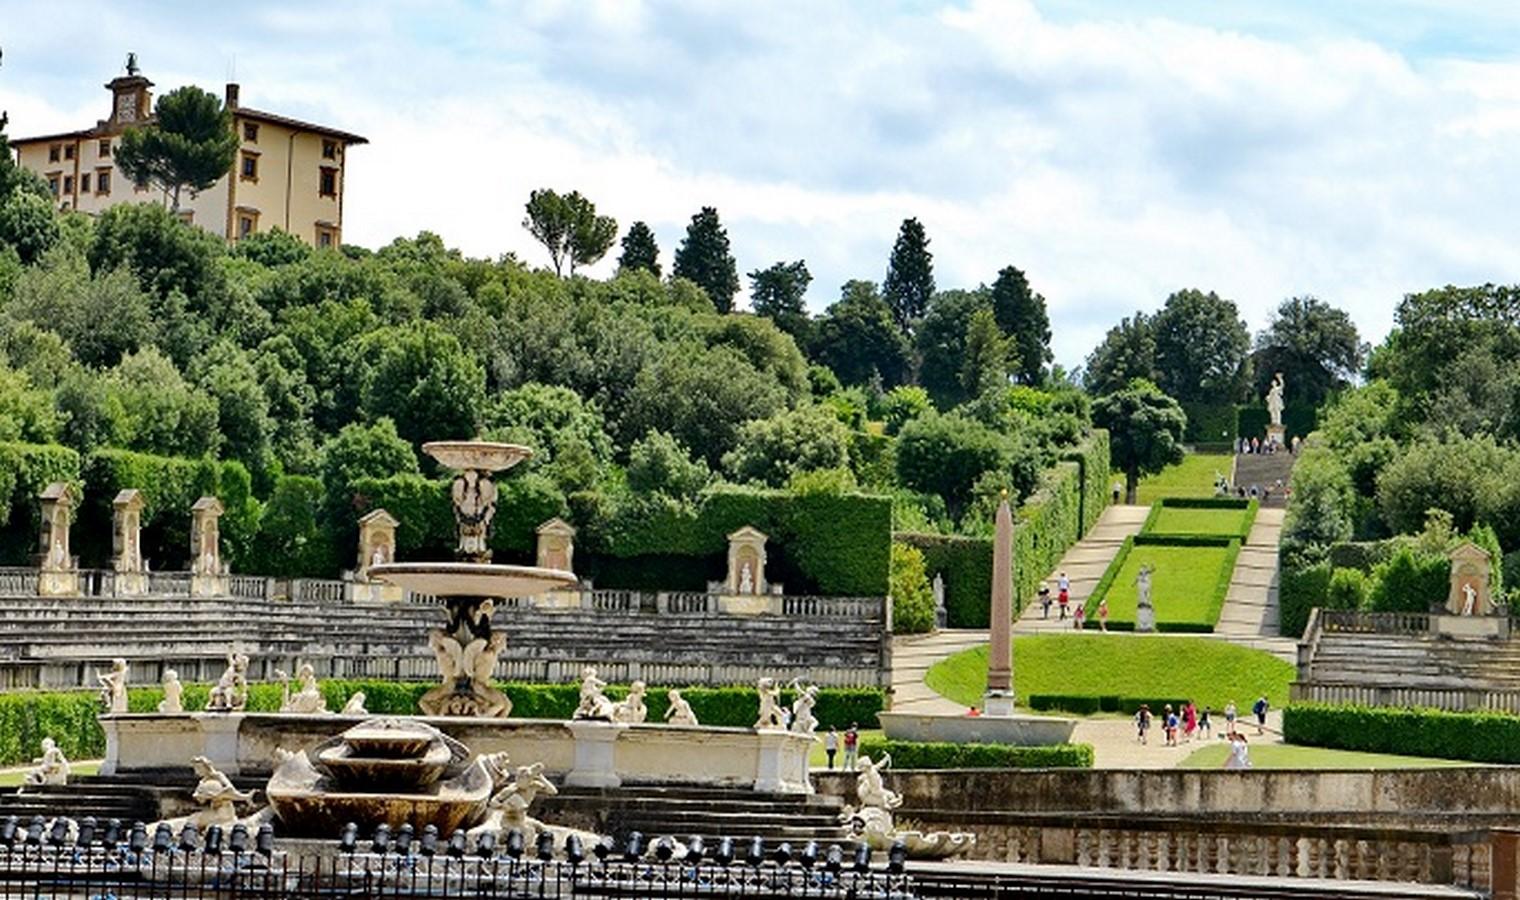 Palazzo Pittiand Boboli Gardens - Sheet3